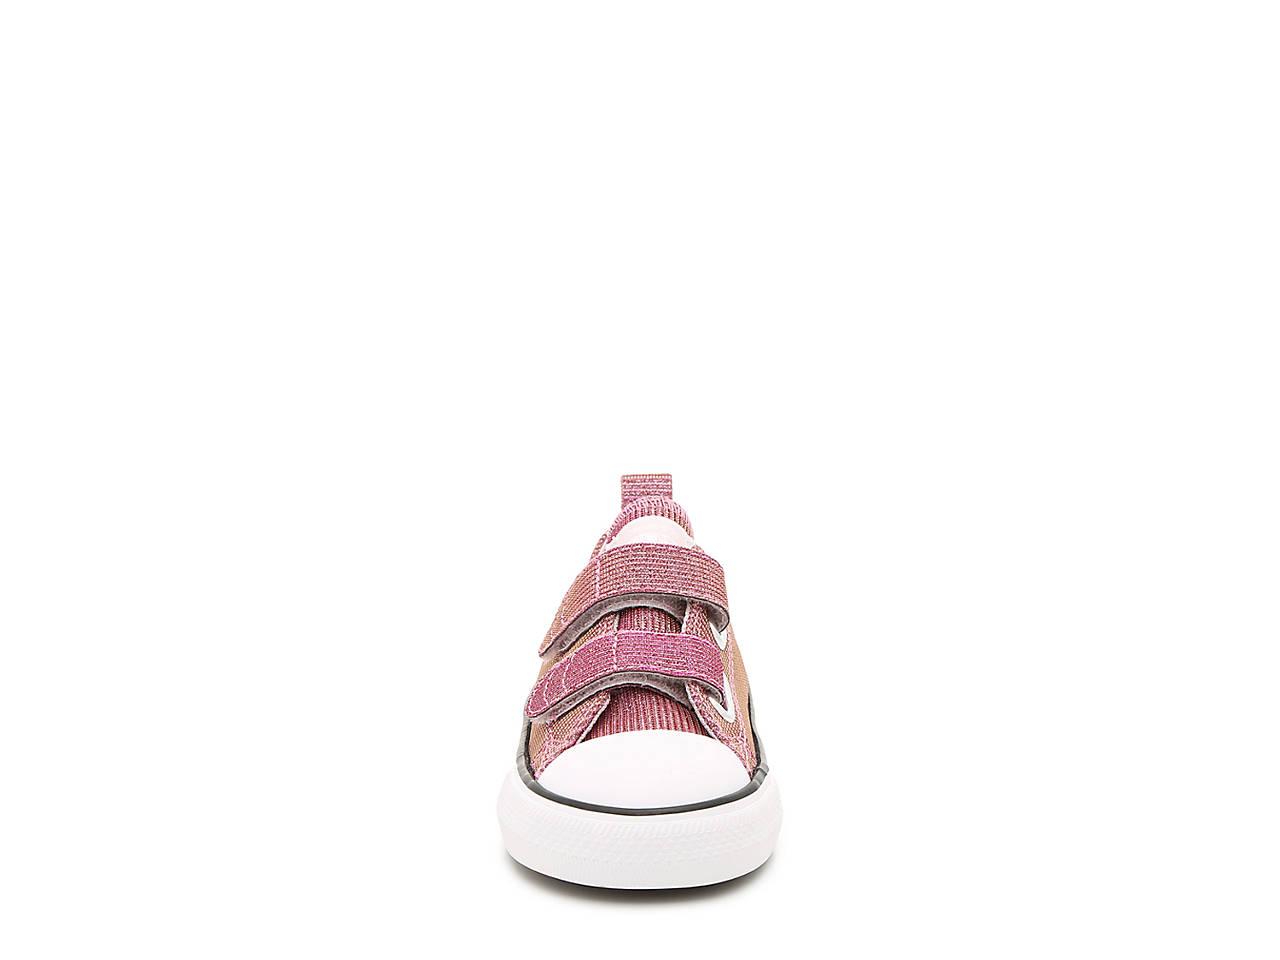 Converse Chuck Taylor All Star Space Star Sneaker Kids